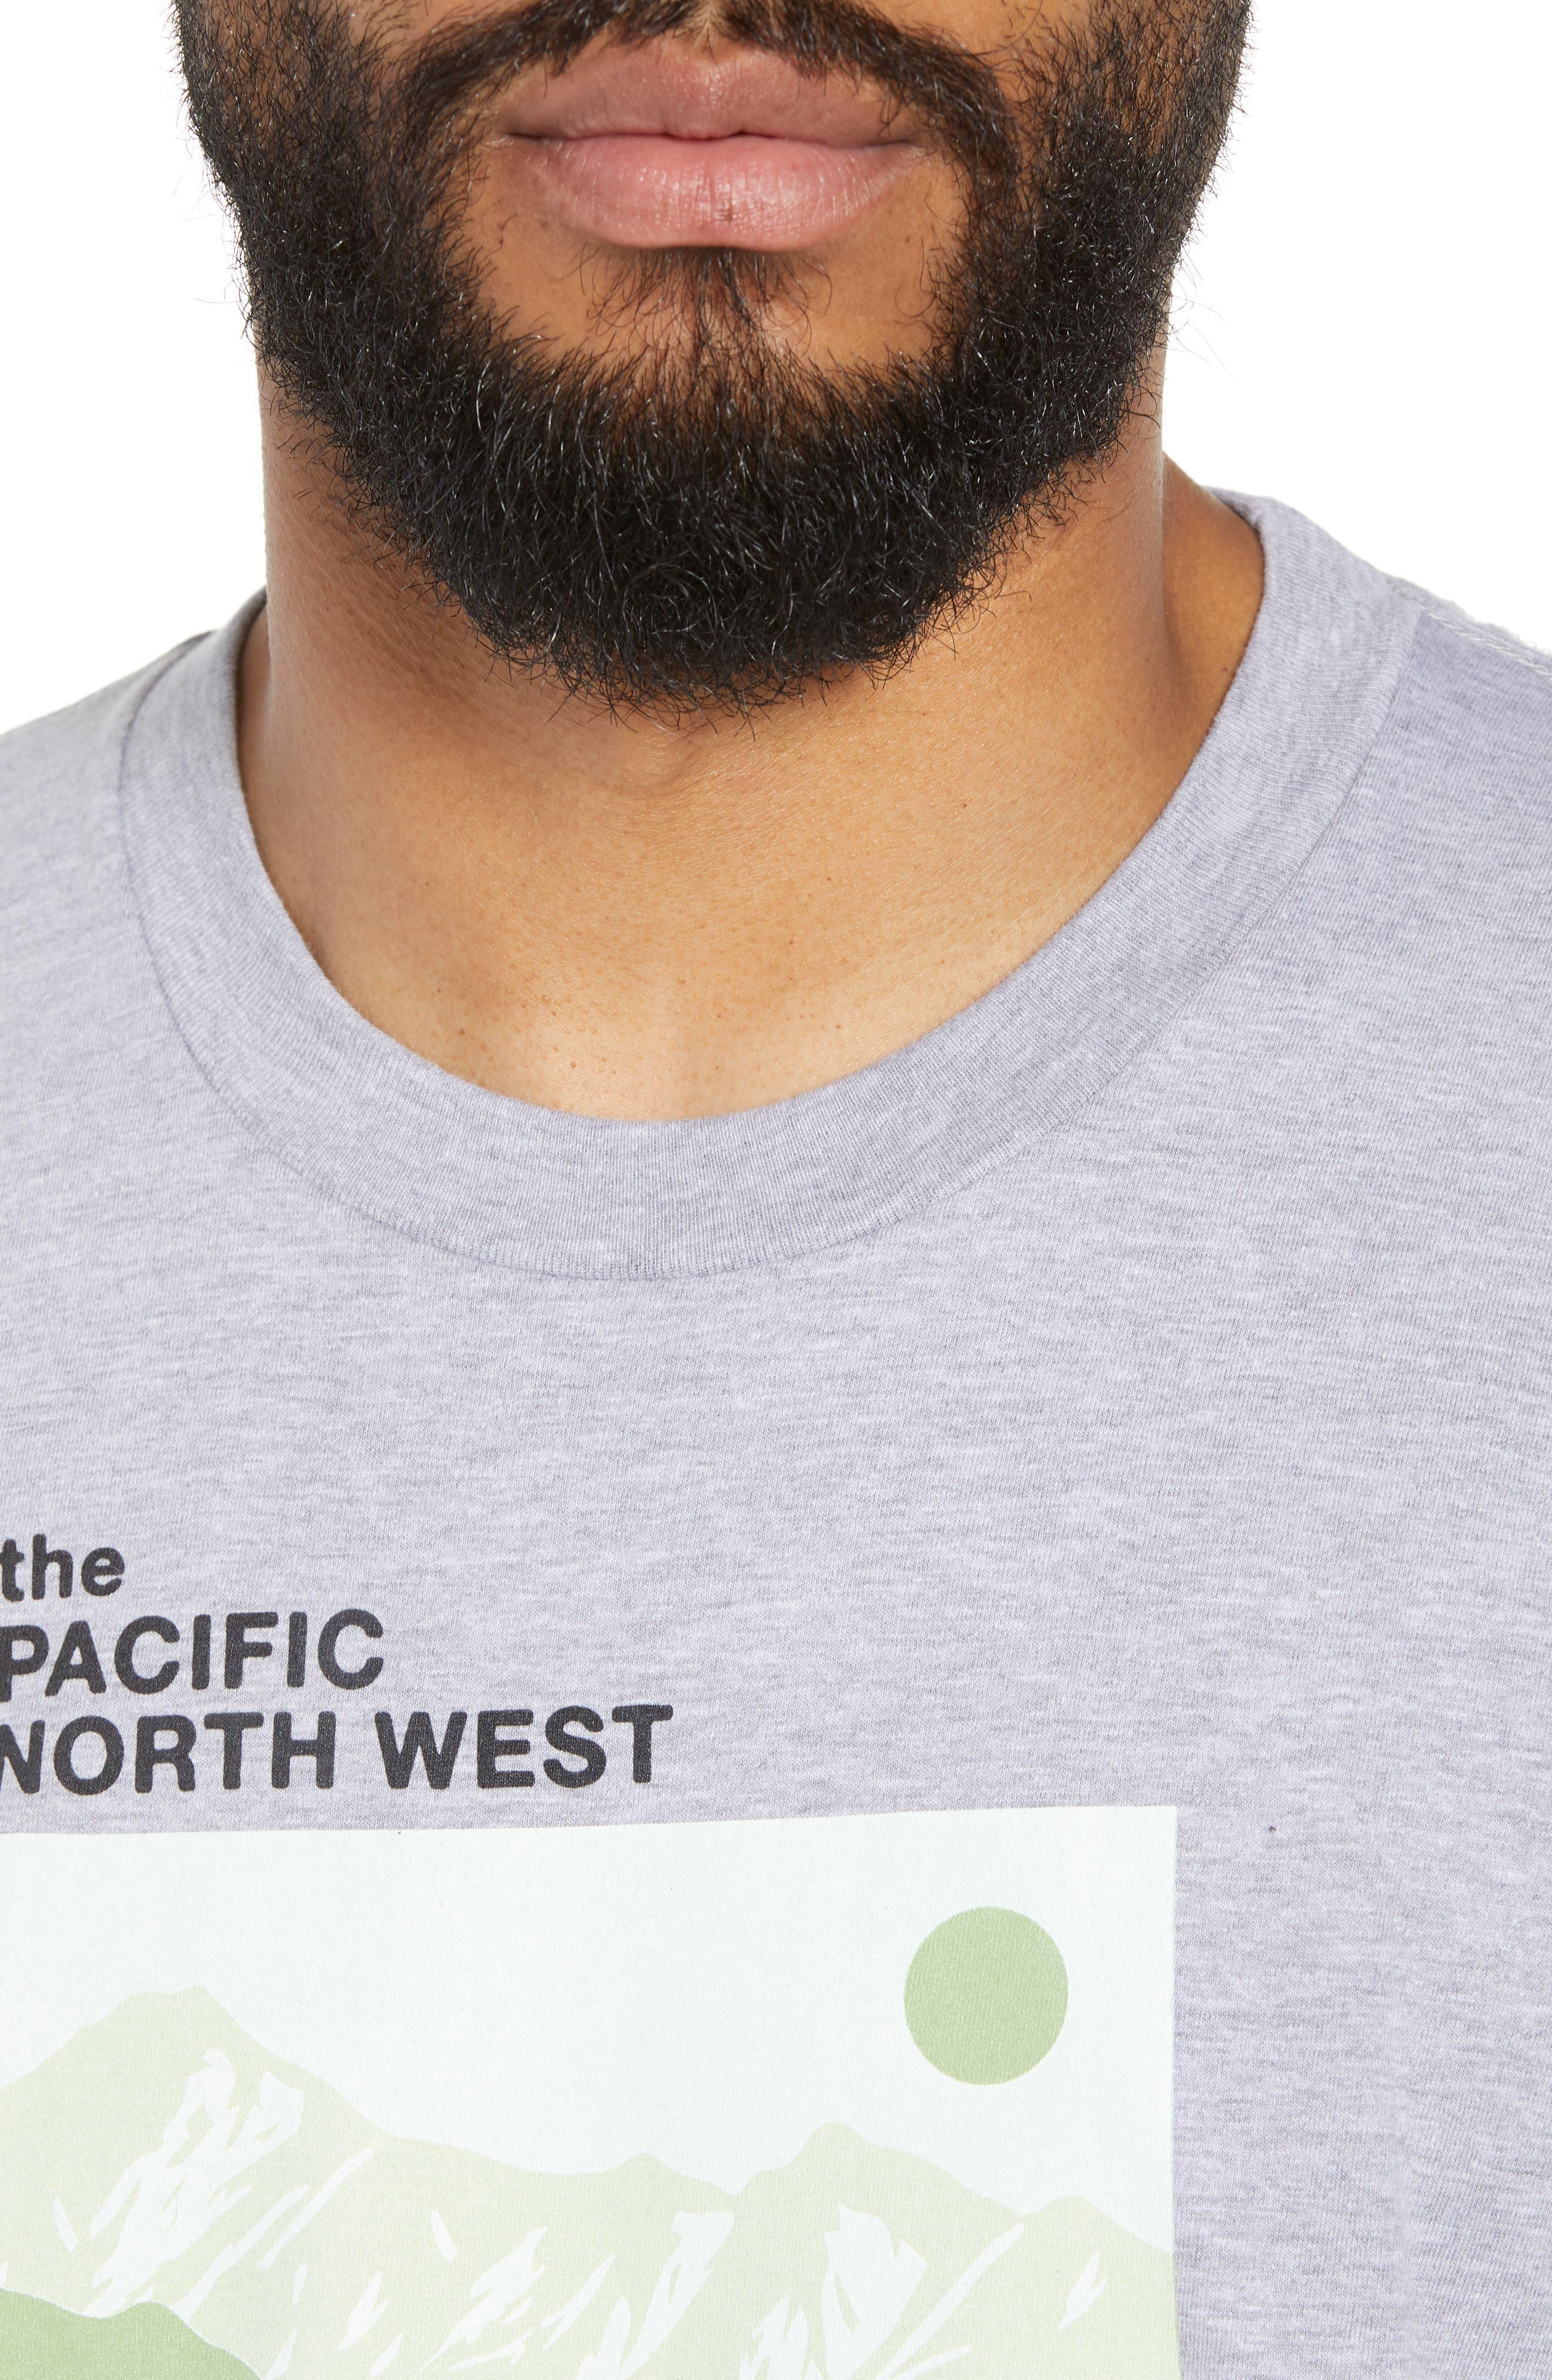 PNW Mountains Graphic T-Shirt,                             Alternate thumbnail 4, color,                             020